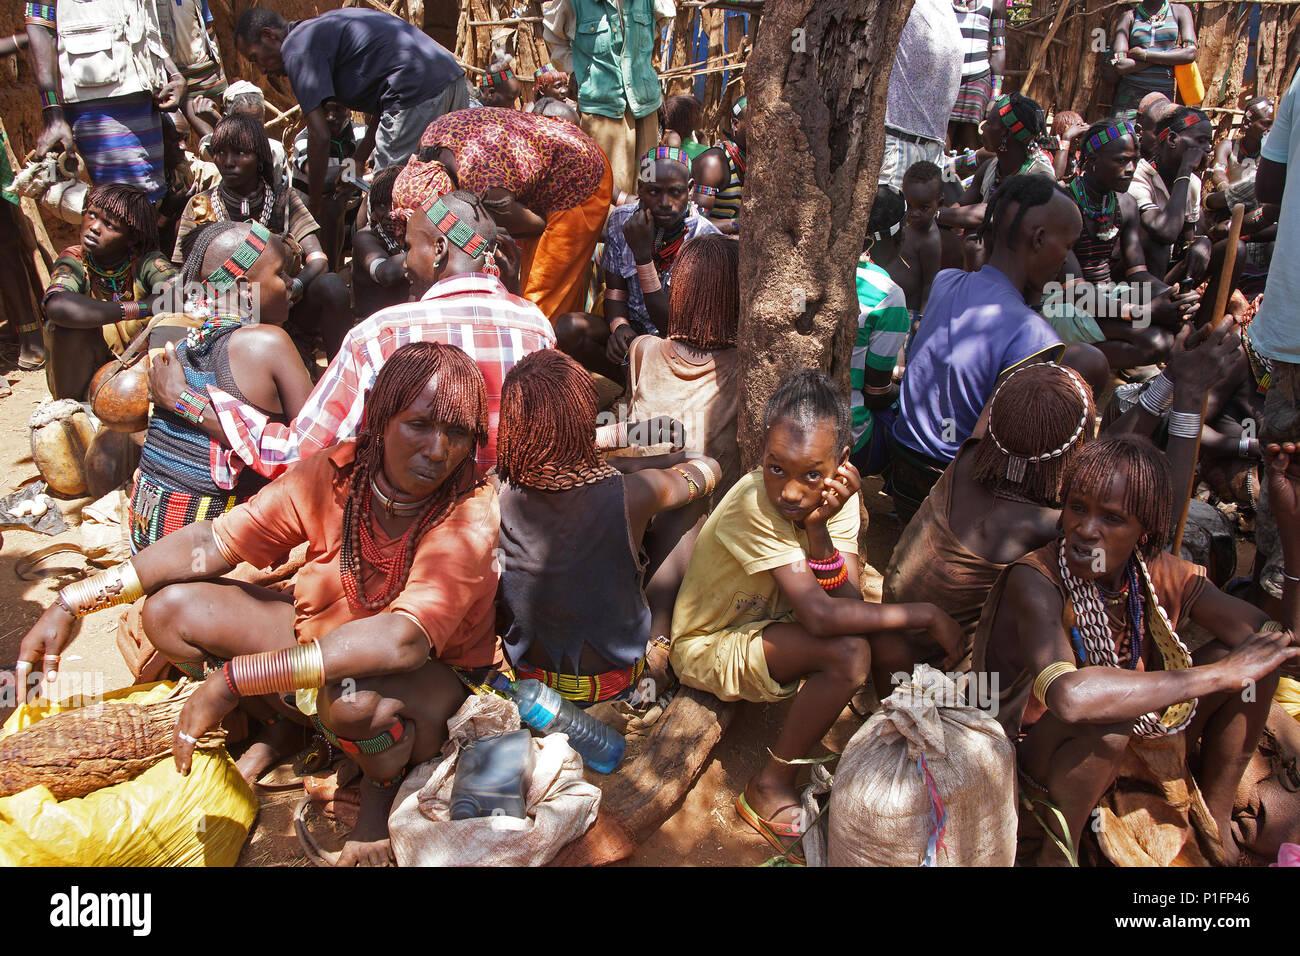 Africa, Ethiopia, Hamer market,, Afrika, Aethiopien, Hamer Markt, - Stock Image